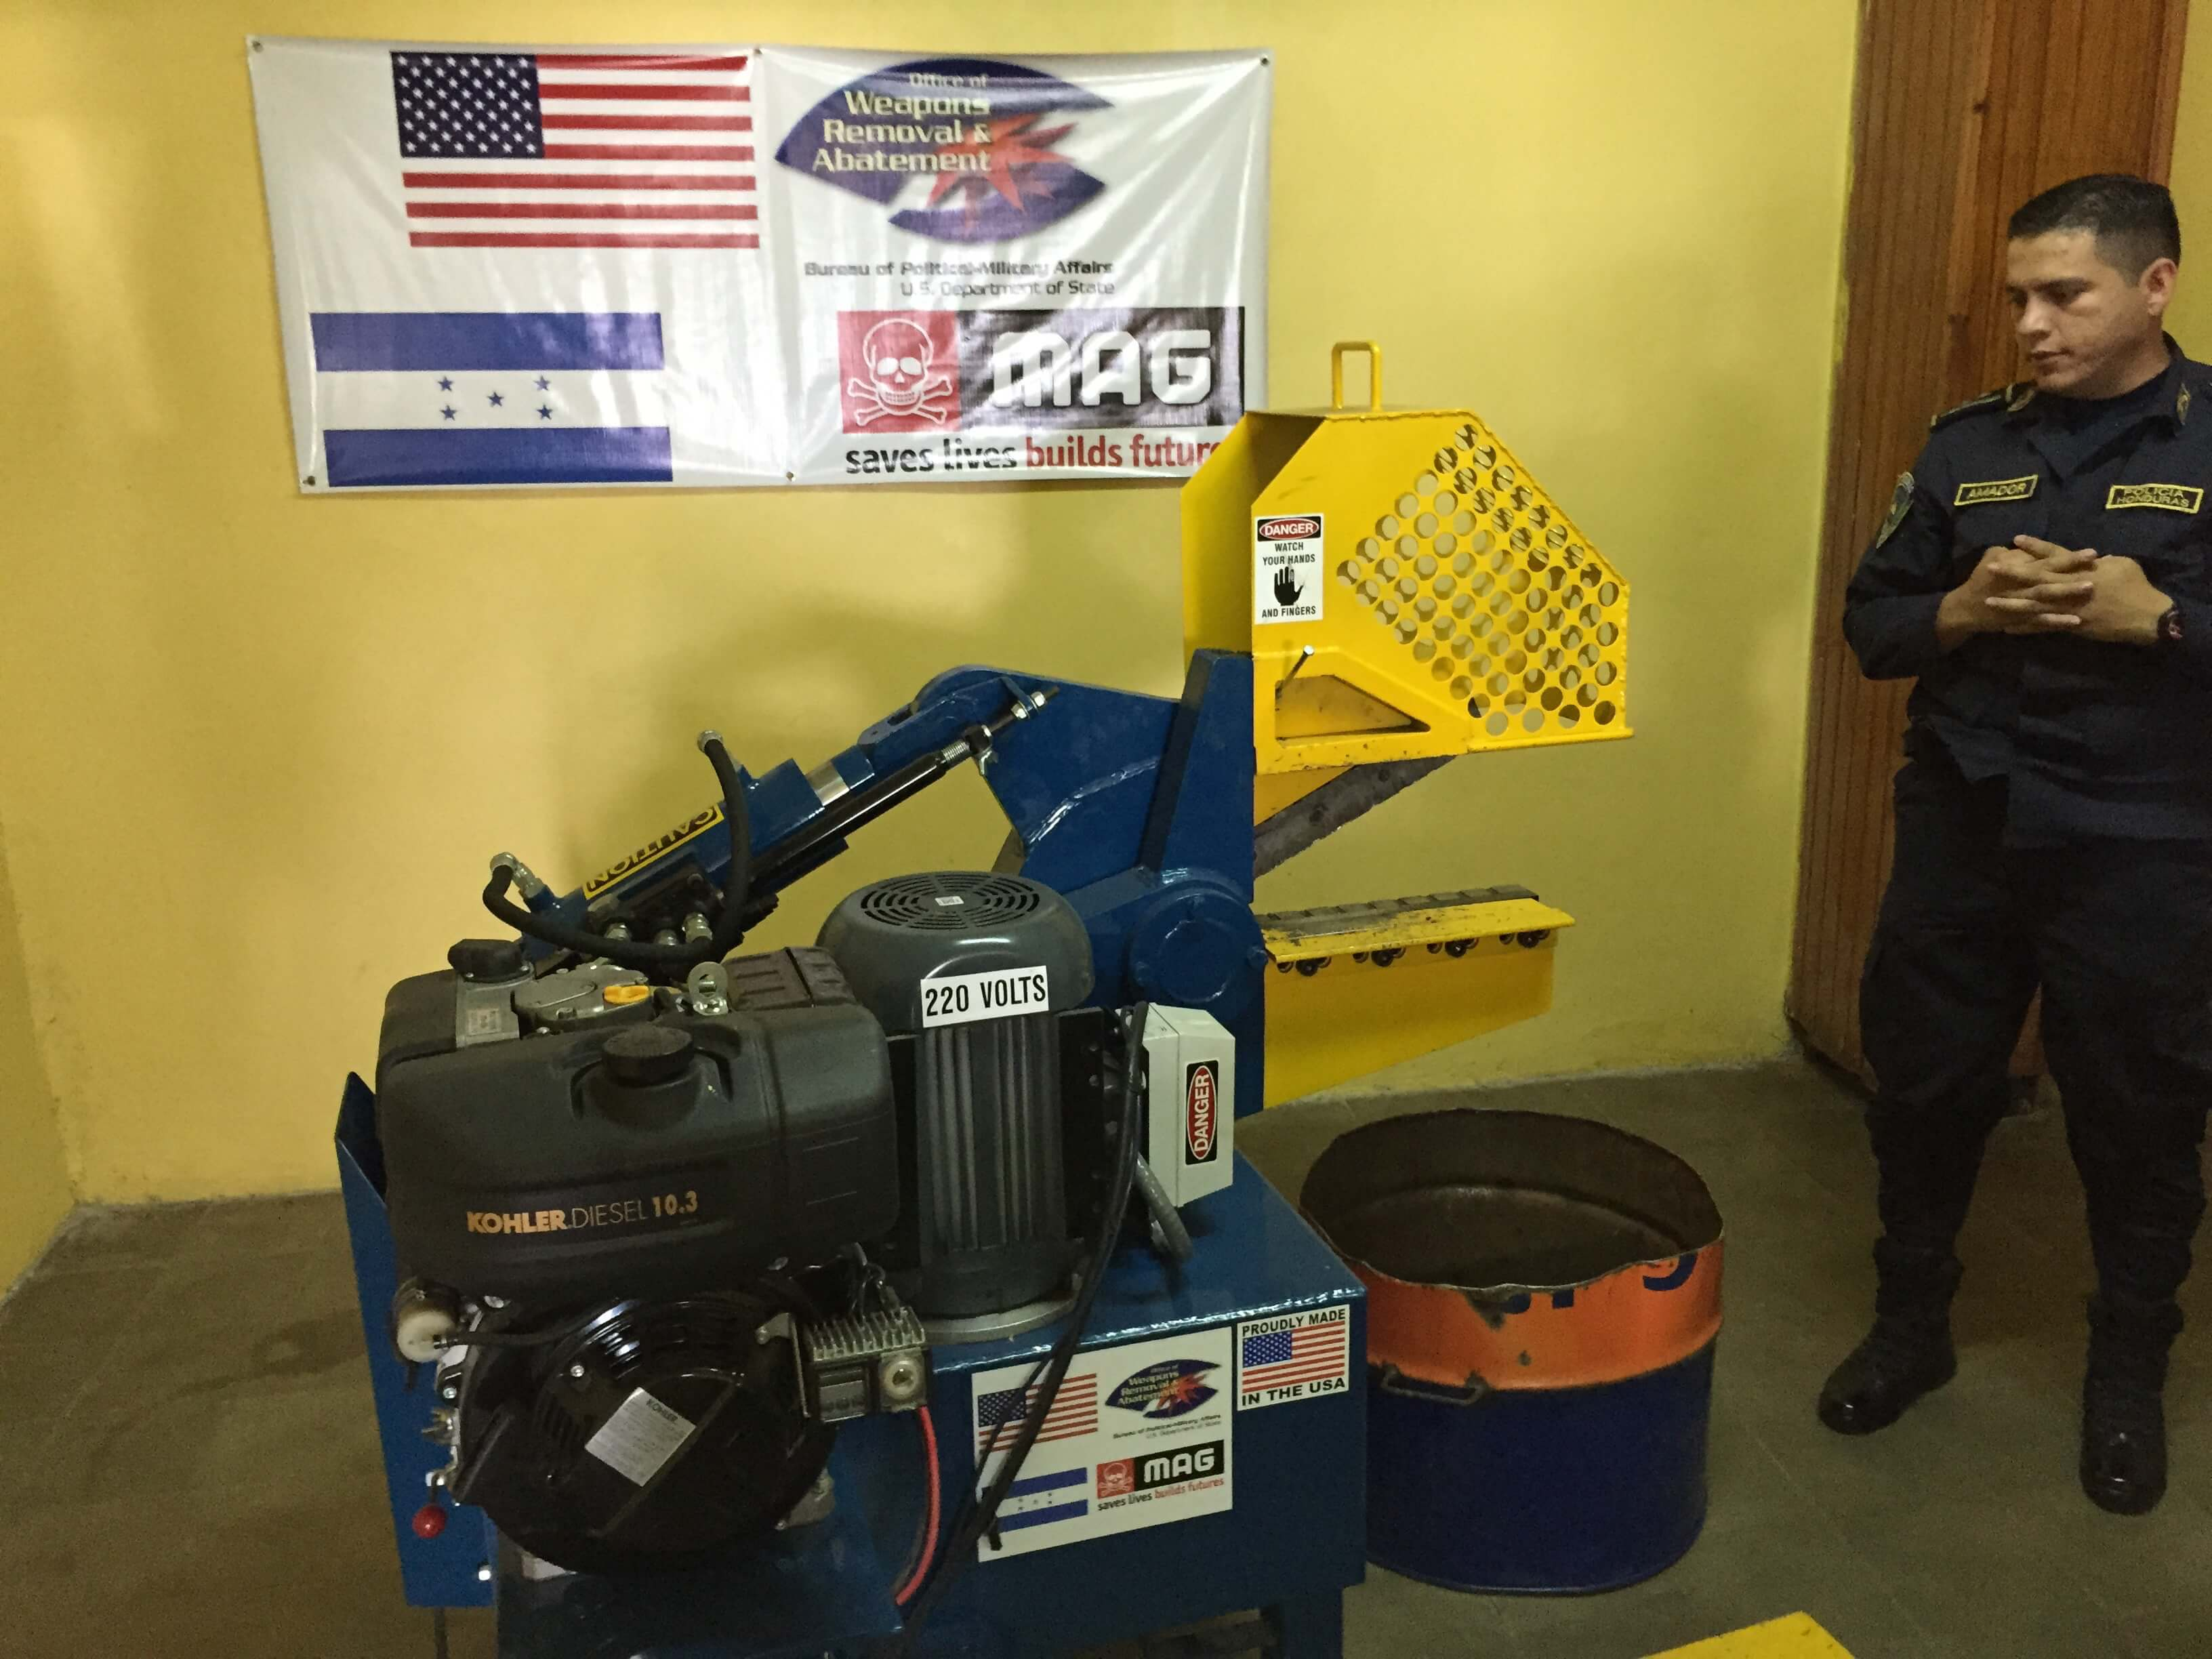 police weapons destruction machine 1